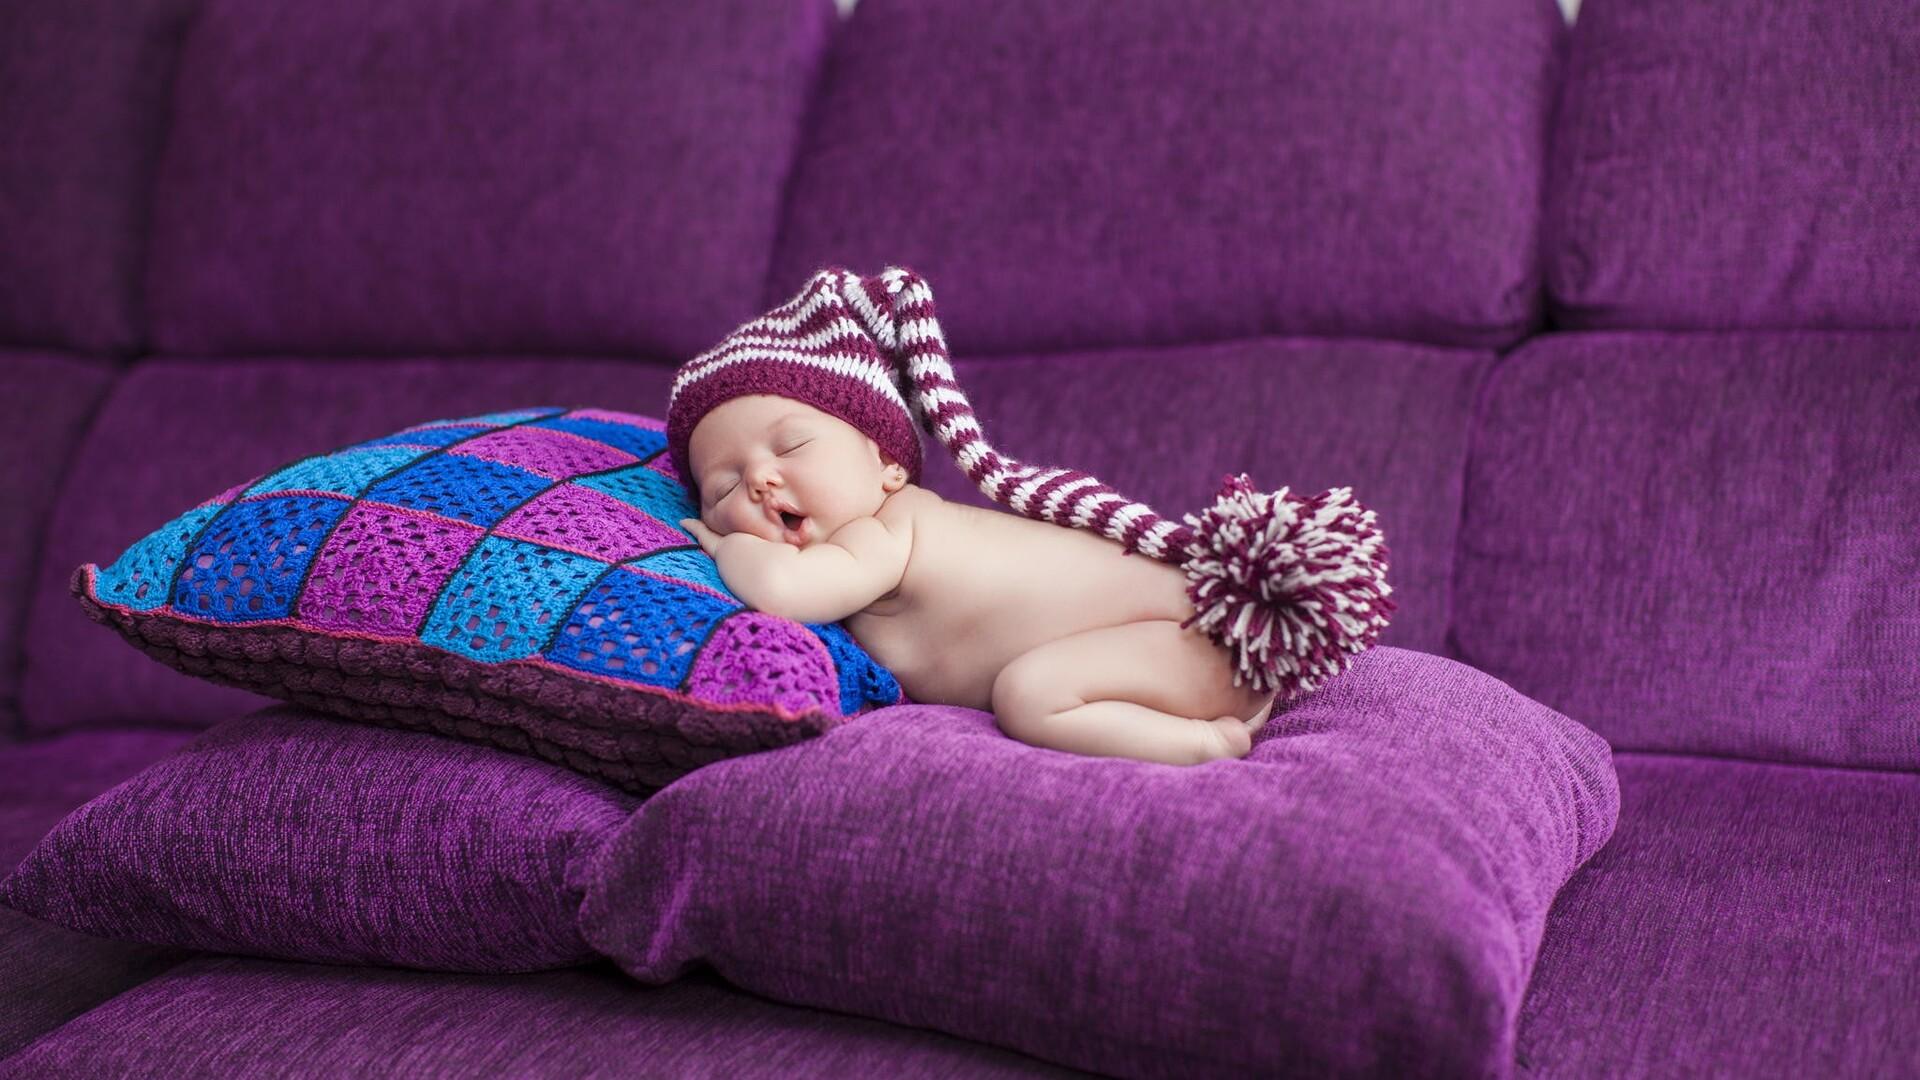 Cute Indian Baby Wallpapers Hd 1920x1080 Cute Sleeping Baby Laptop Full Hd 1080p Hd 4k